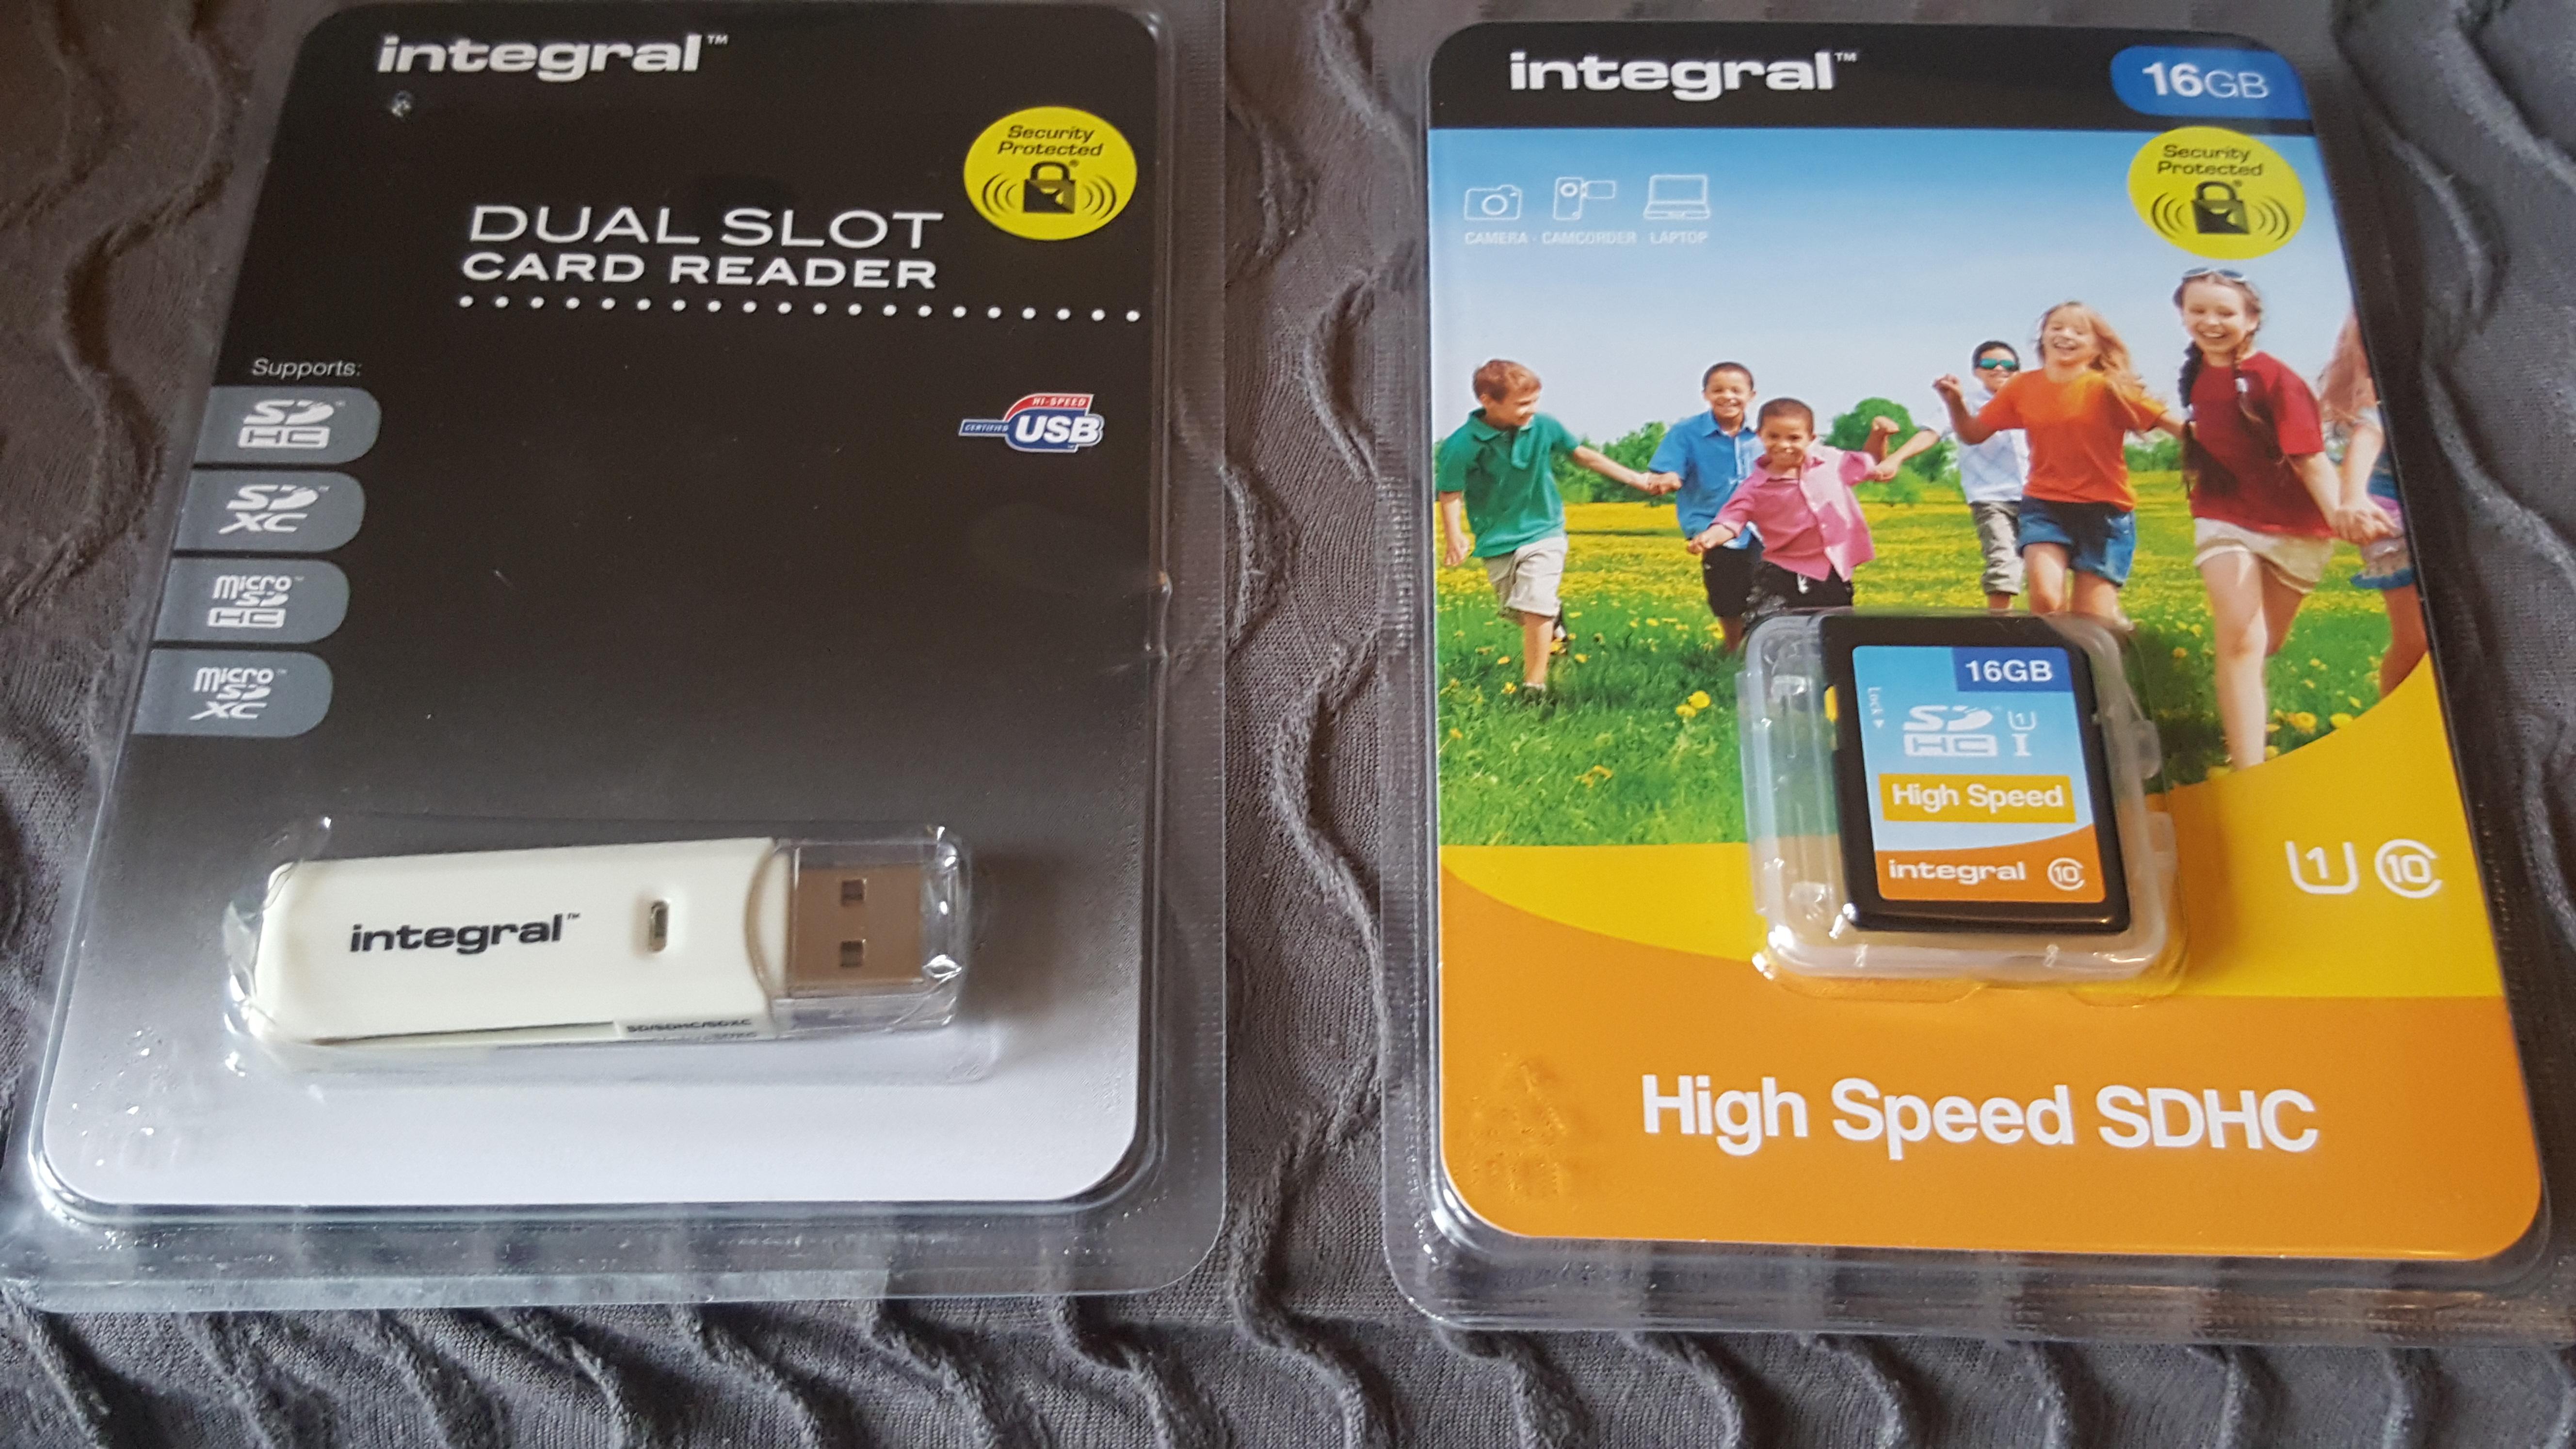 Intergral 16gb sdhc card £1.50 / Integral dual slot card reader £1.50 at Wilkinson Wakefield